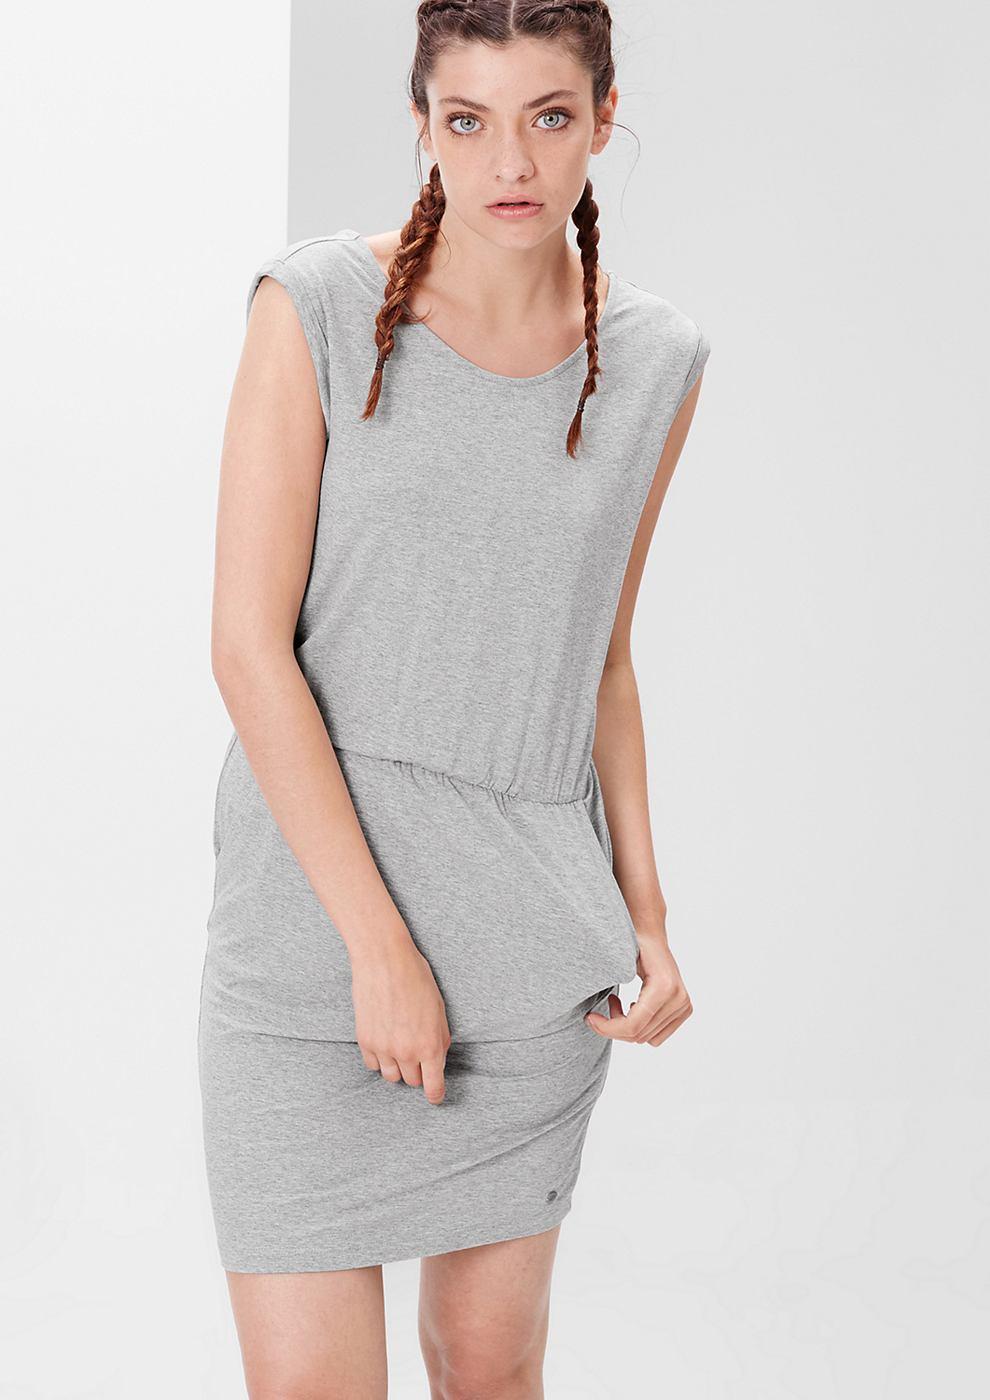 s.Oliver Sportieve jersey jurk grijs